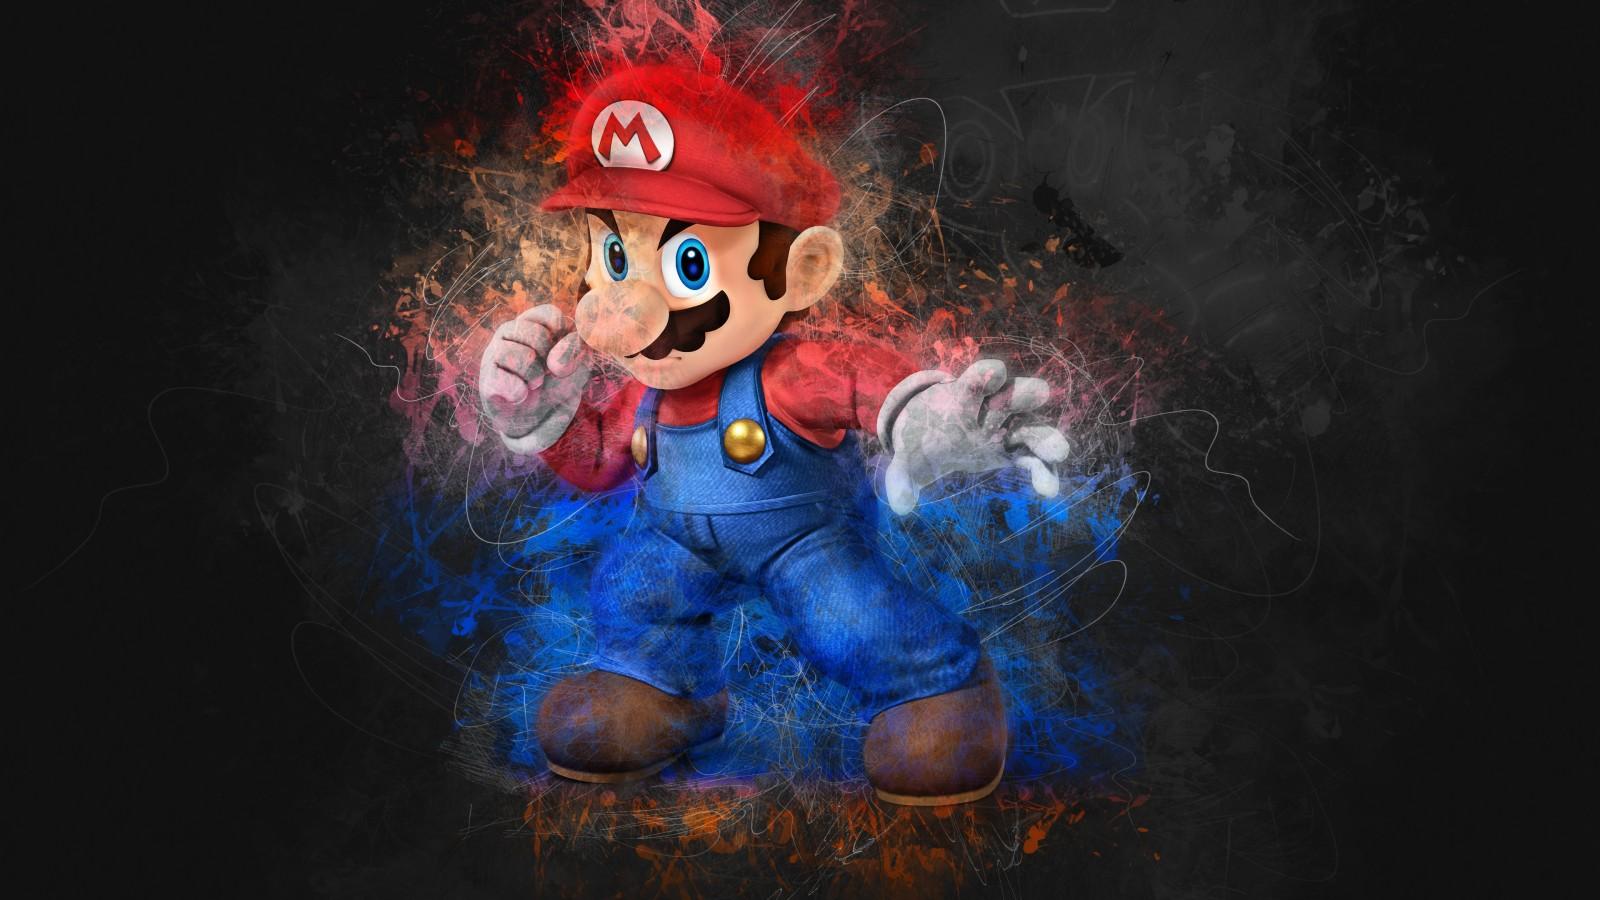 Super Mario Artwork 4K Wallpapers HD Wallpapers ID 25060